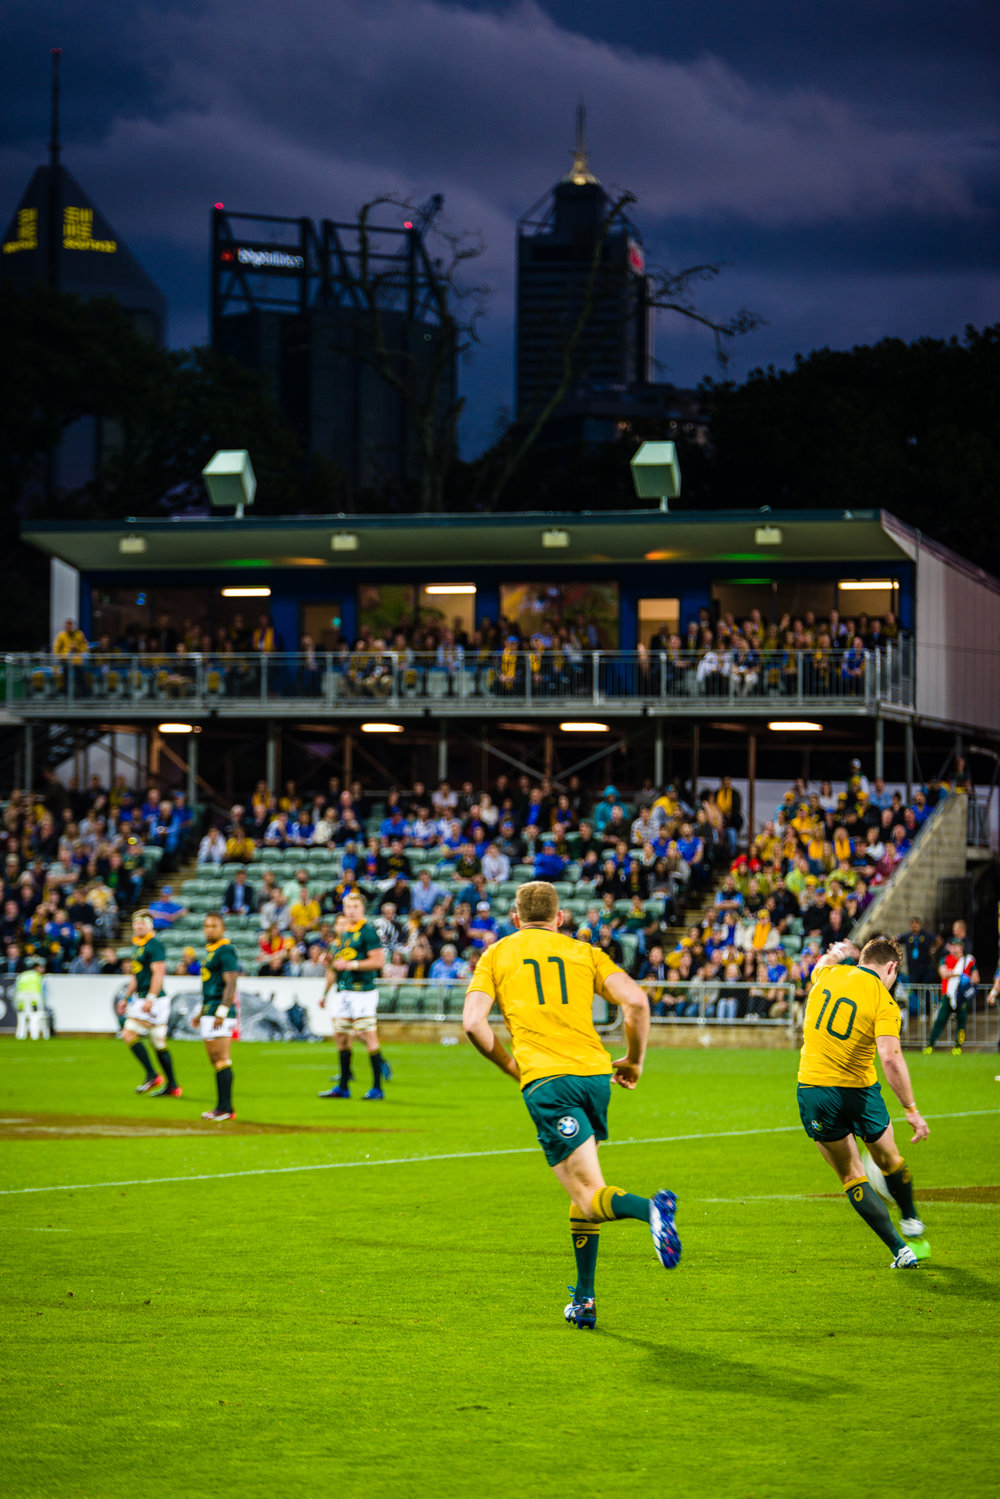 Spyrides_Kyle_RugbyChampionship_Perth_9.9.2017_DSC7239.jpg